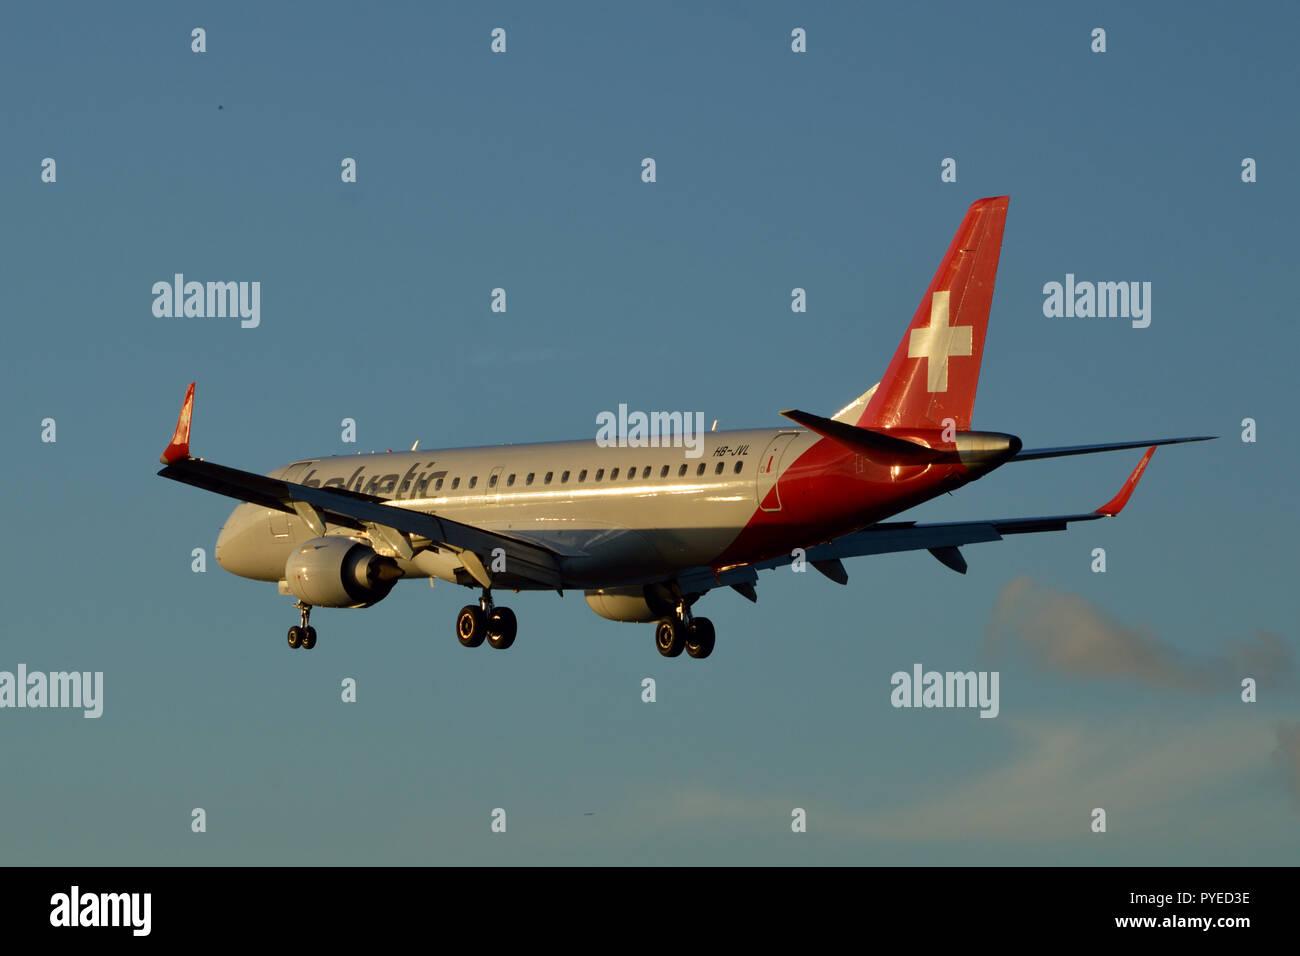 Helvetic Airways Embraer ERJ-190LR landing at London City Airport at  sunset - Stock Image